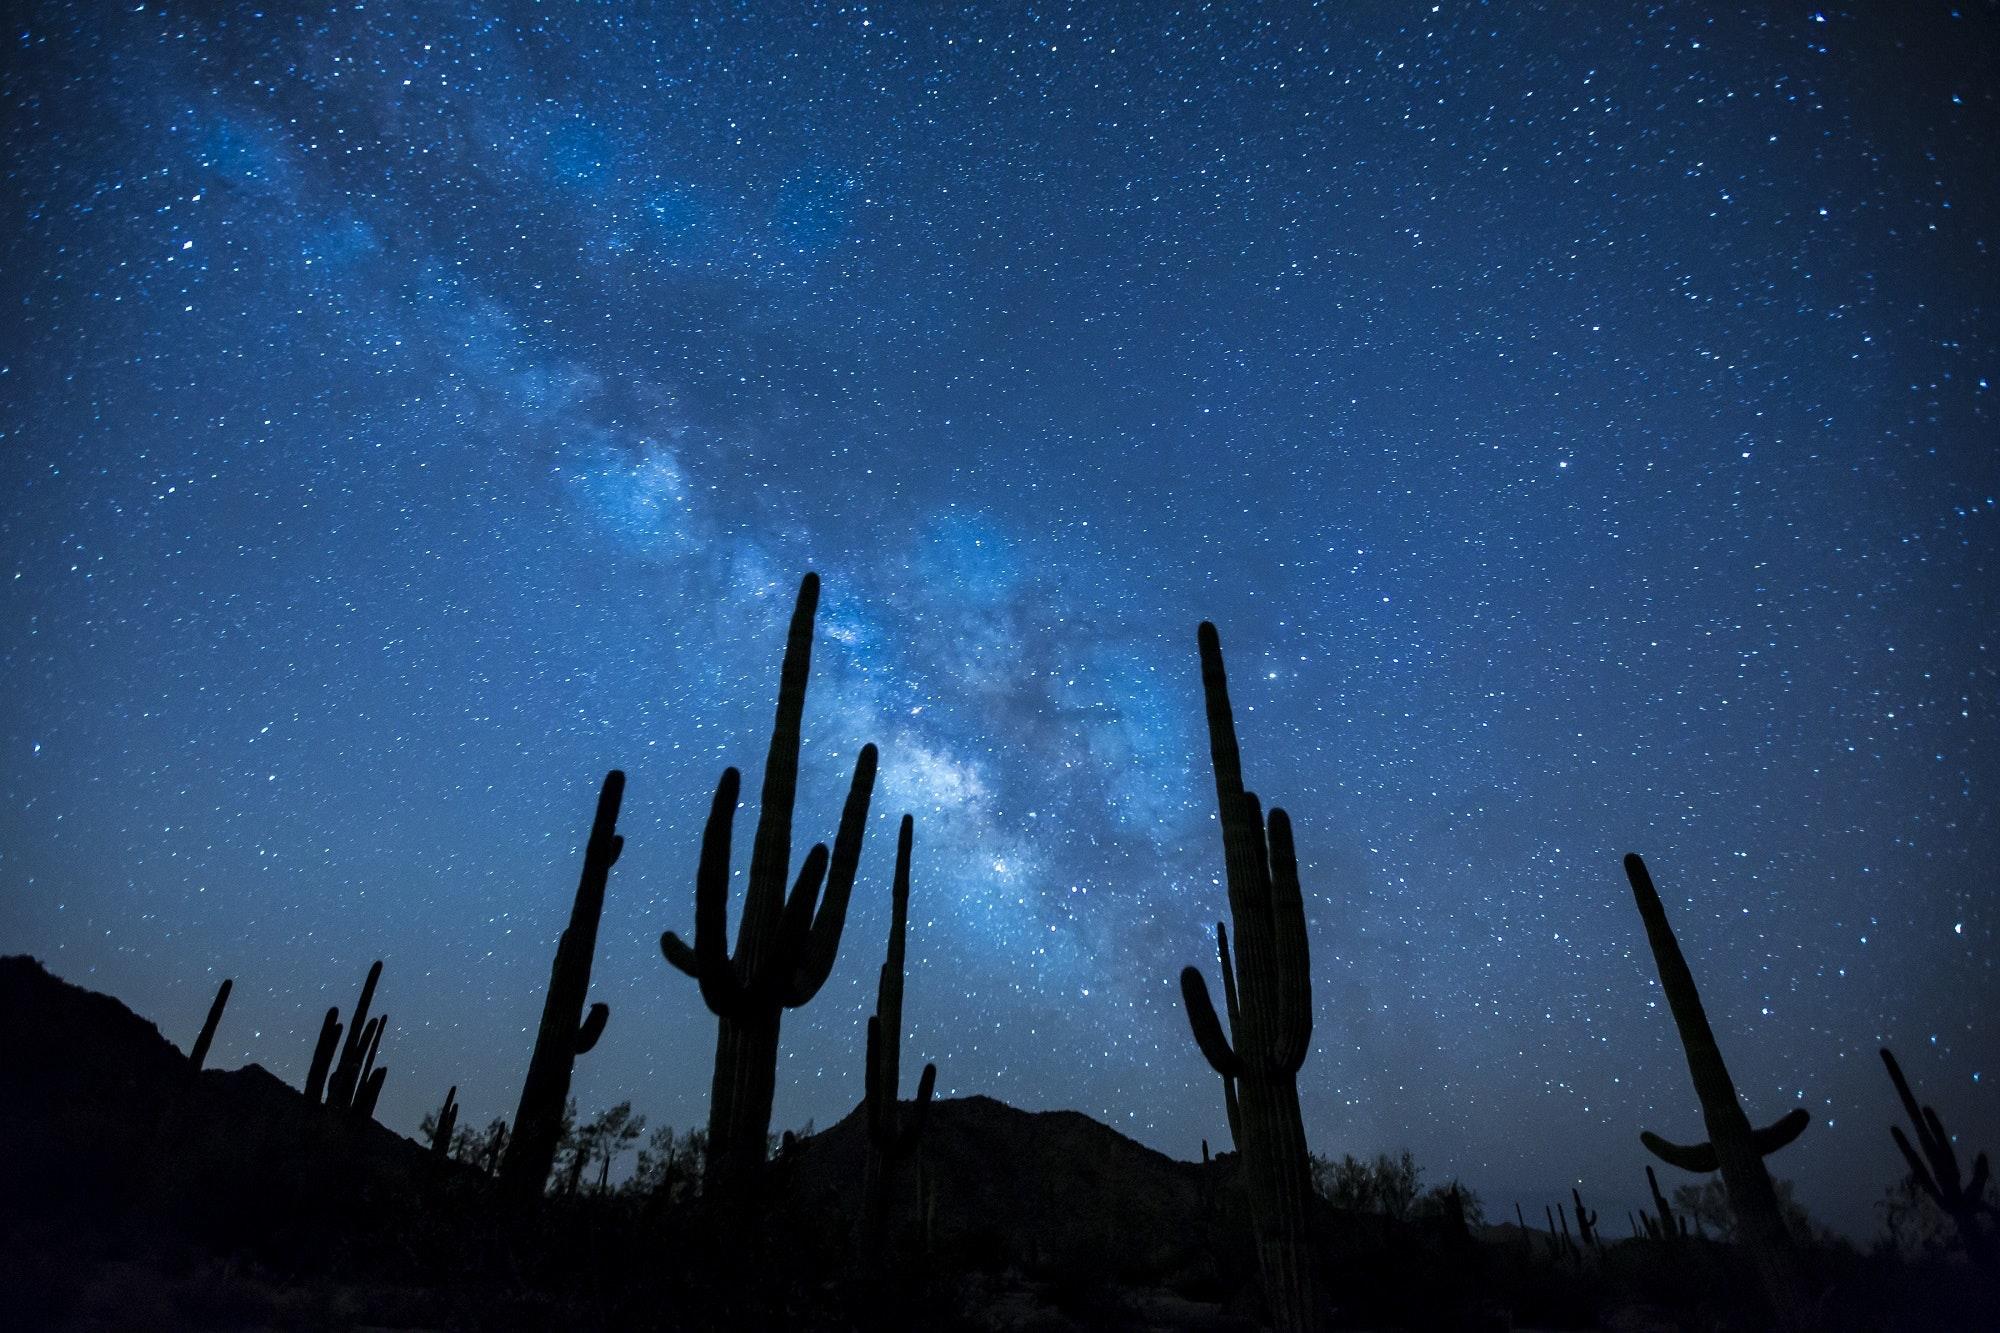 Cactus plants under the starry sky photo